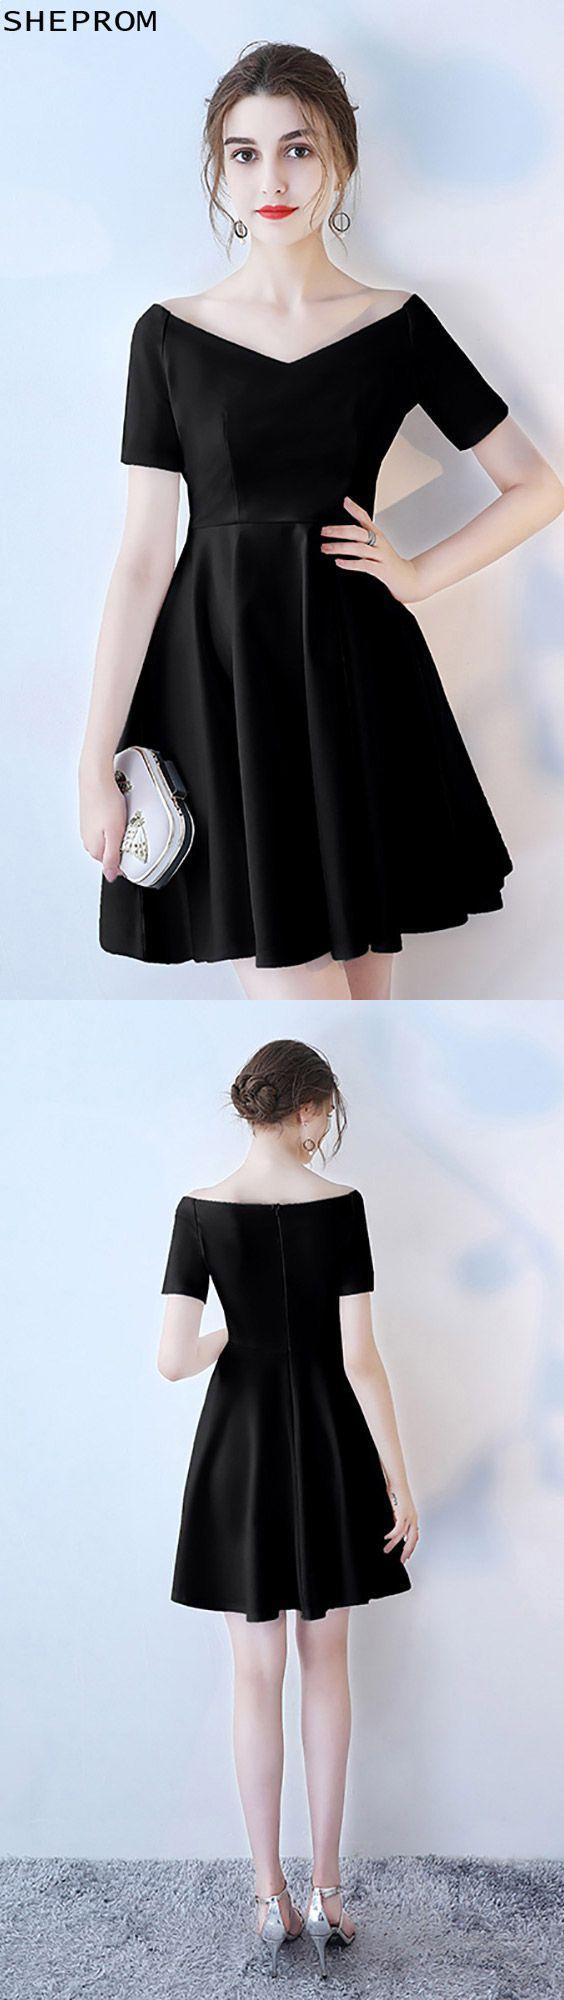 Short black vneck homecoming dress with short sleeves